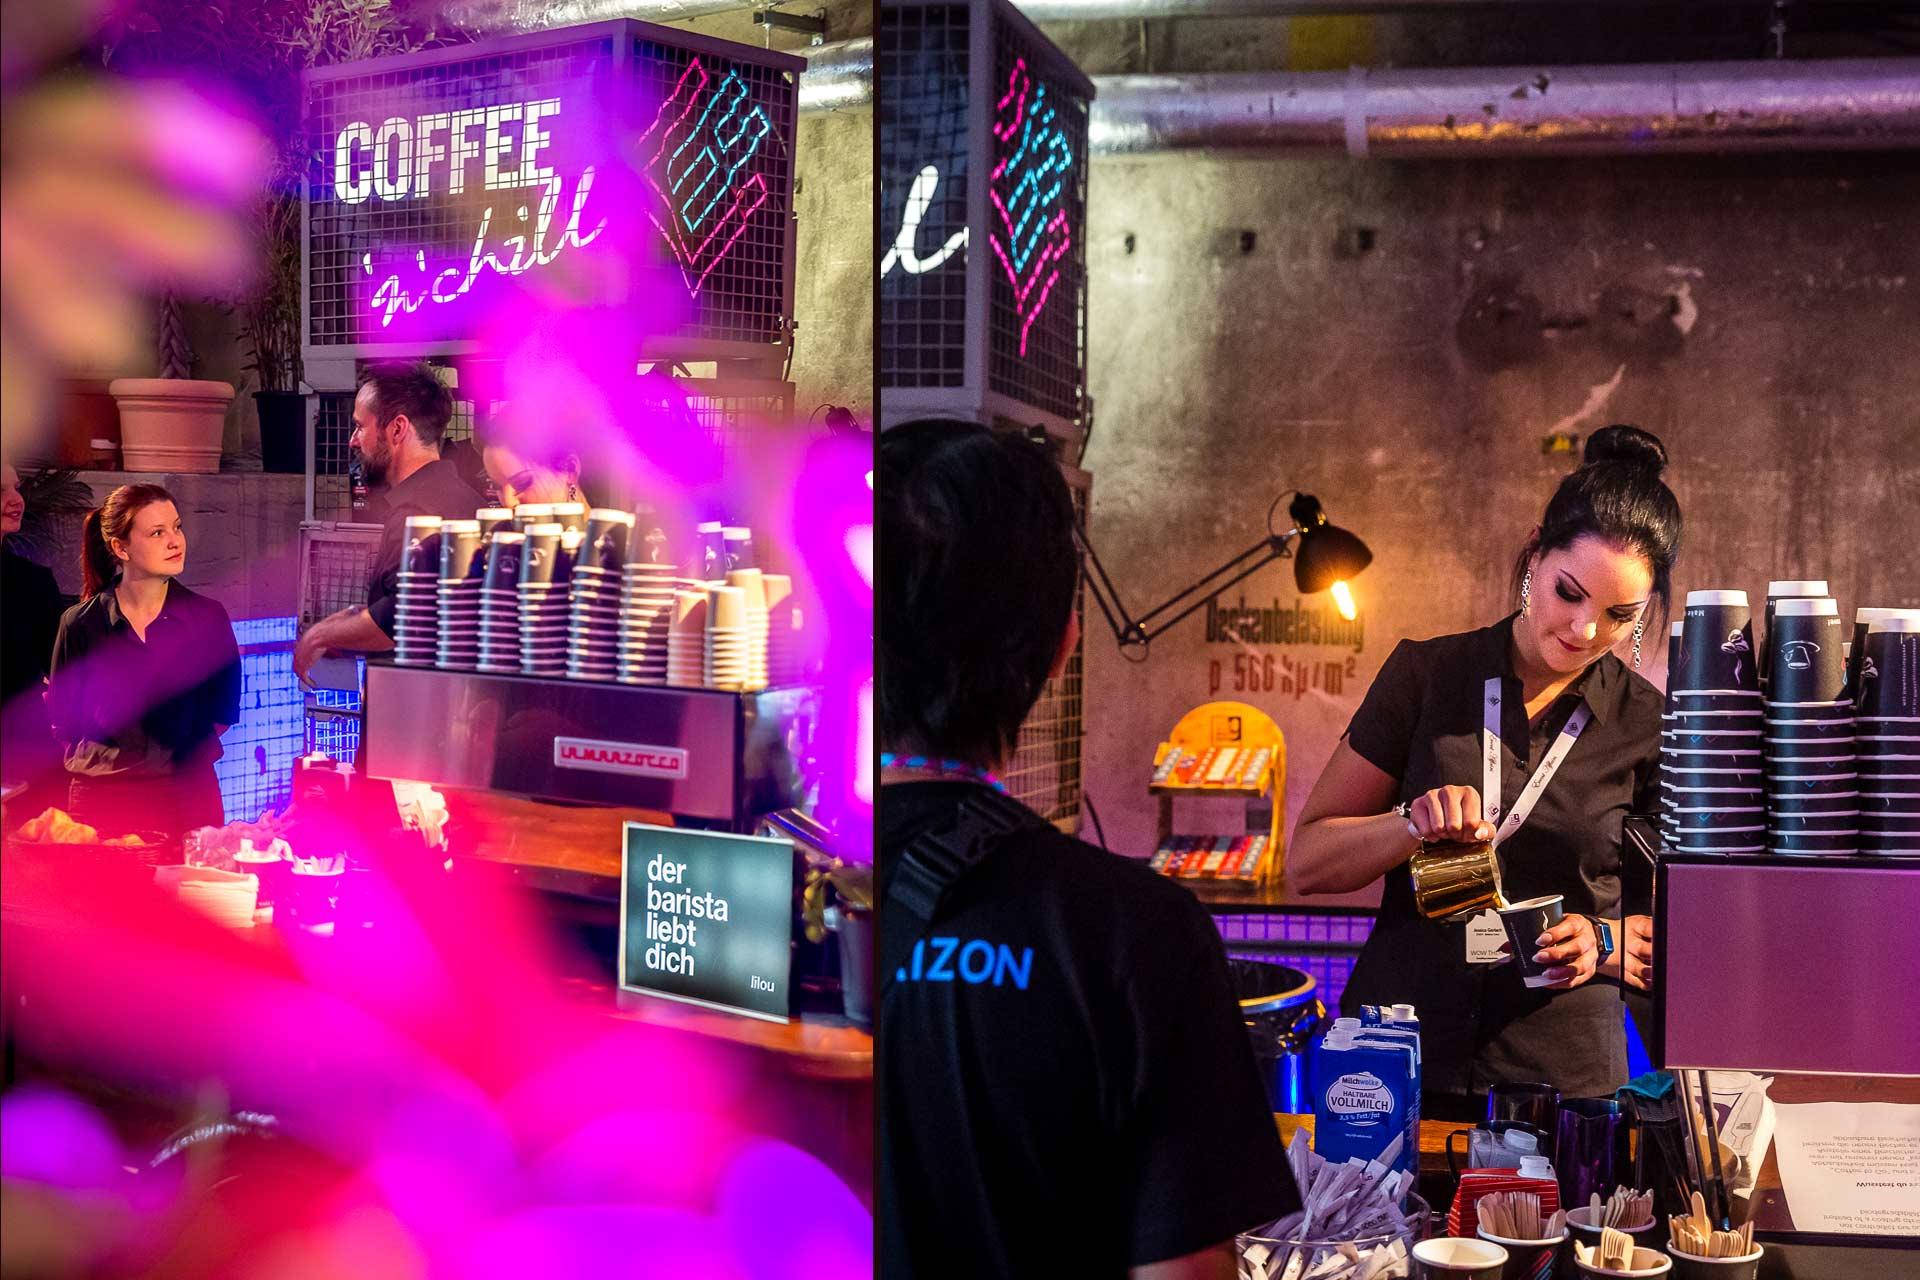 eventfotos-berlin-barista-coffee-kongress